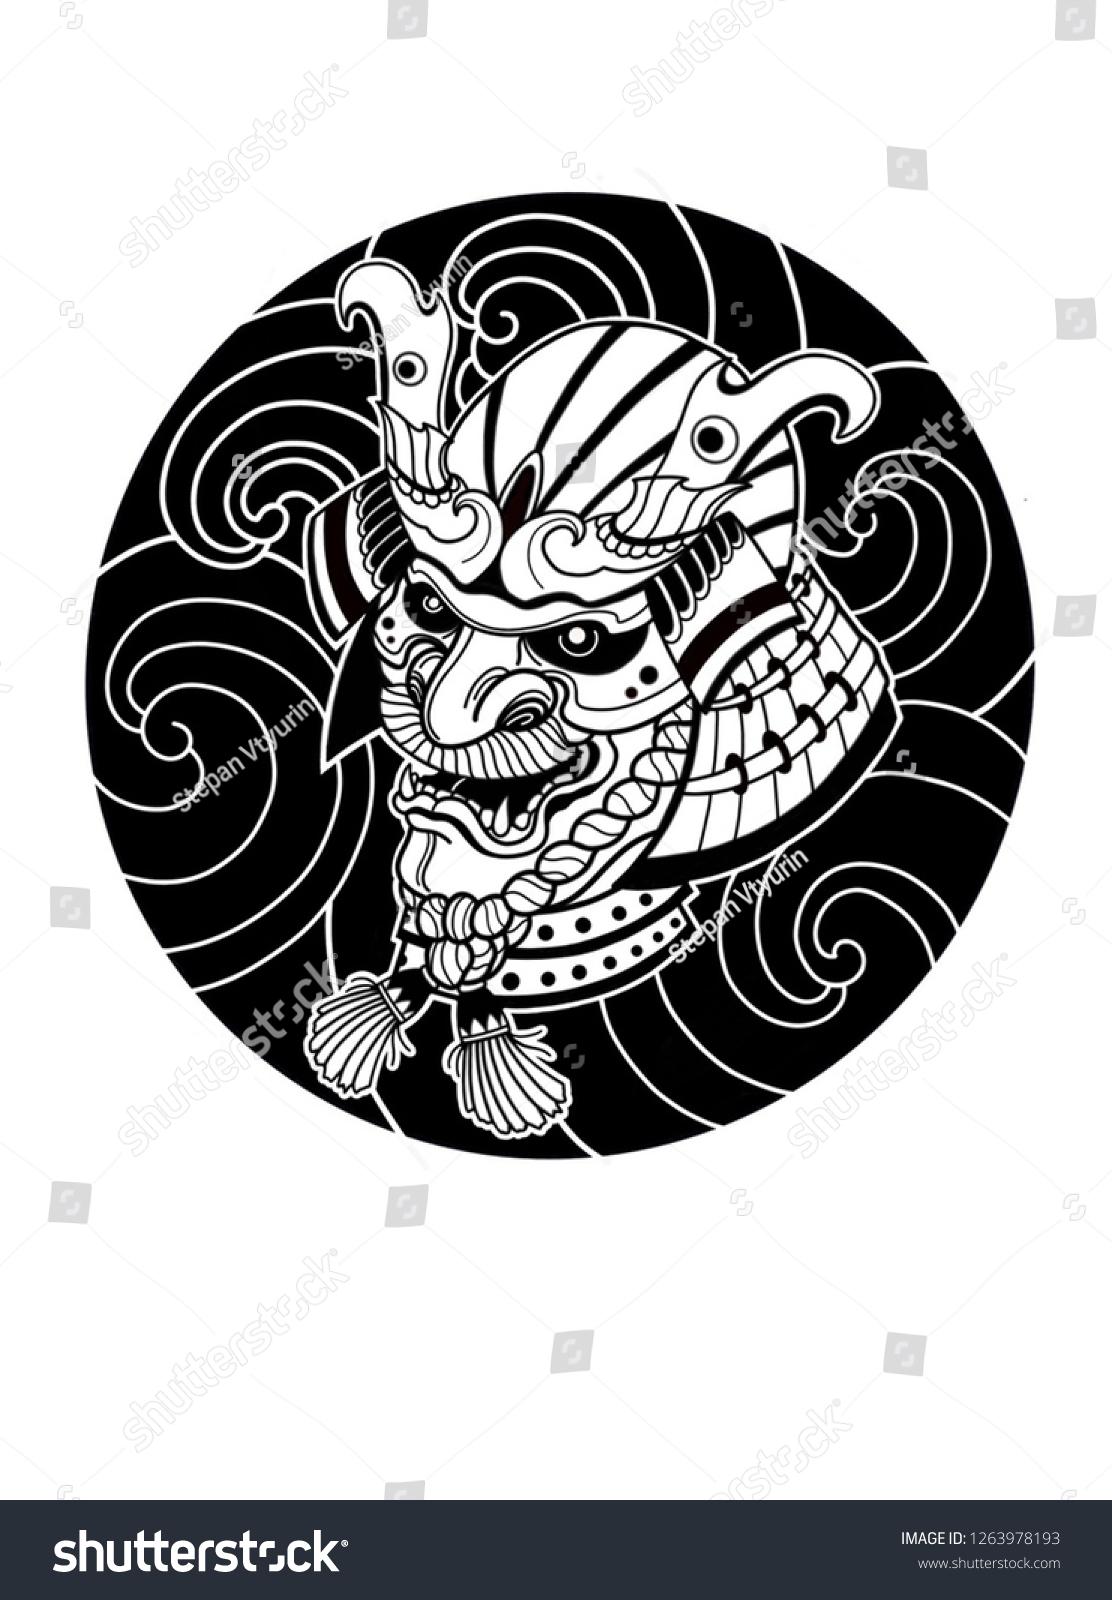 Samurai Mask Art Stock Illustration 1263978193